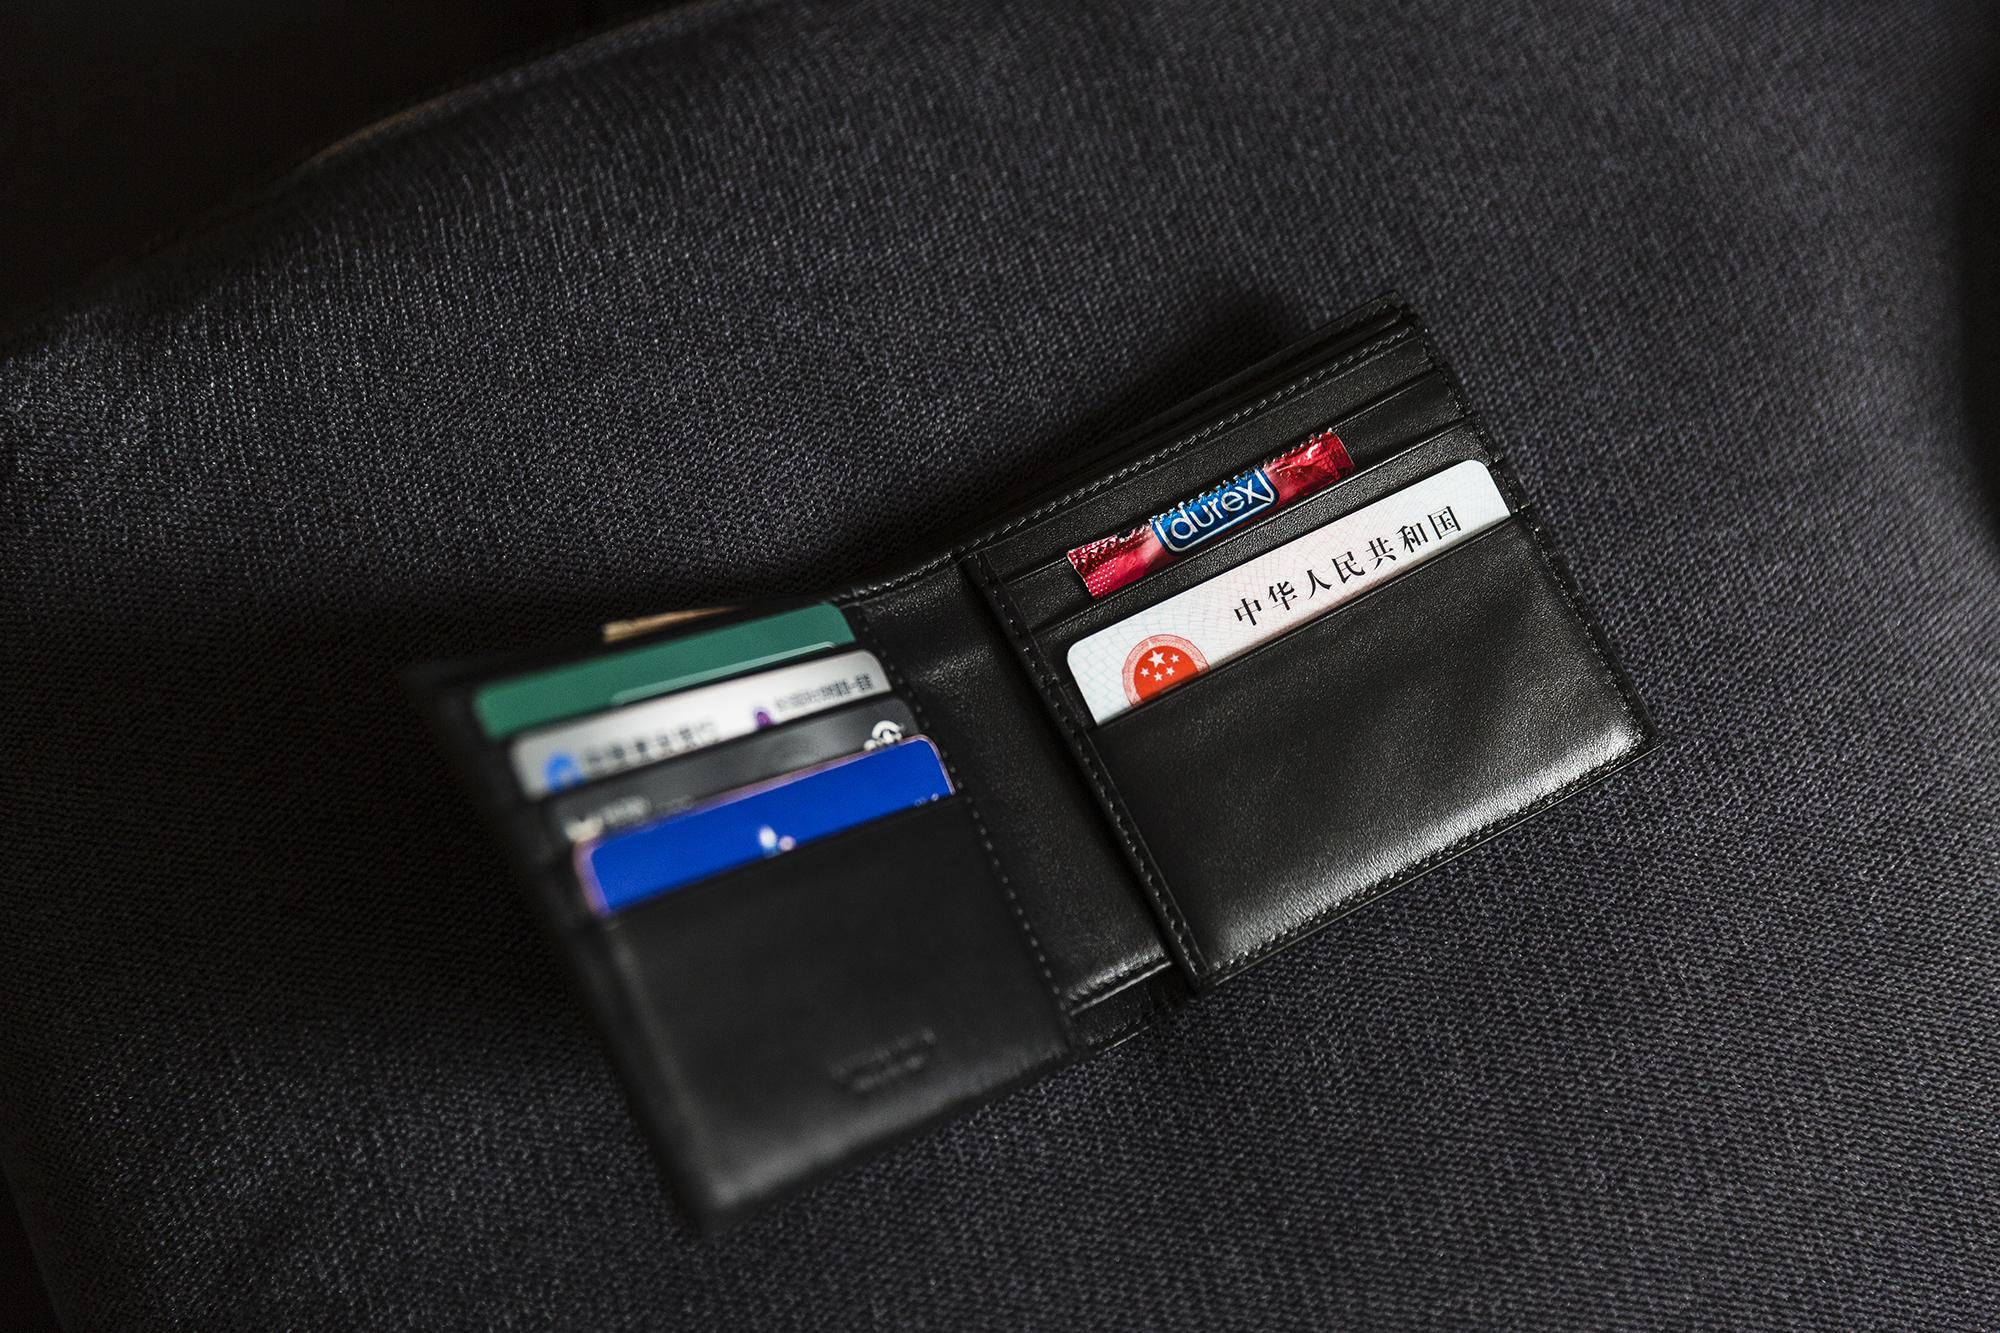 A PUA mentor's wallet, May 17, 2015.